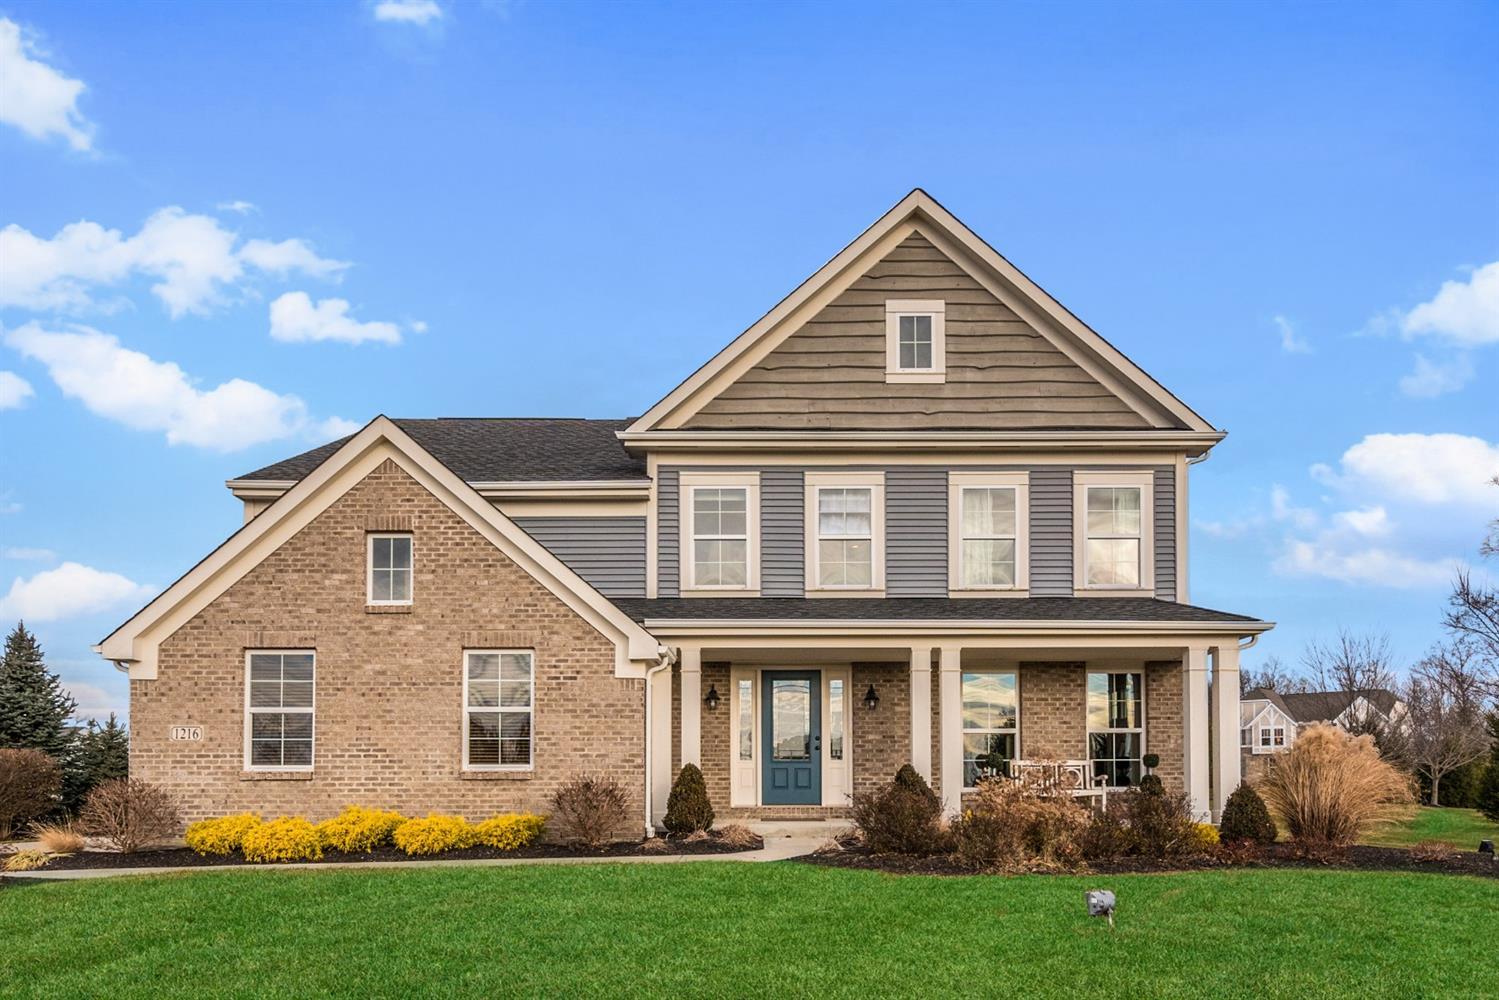 Property for sale at 1216 Saddletop Ridge, Batavia Twp,  OH 45103